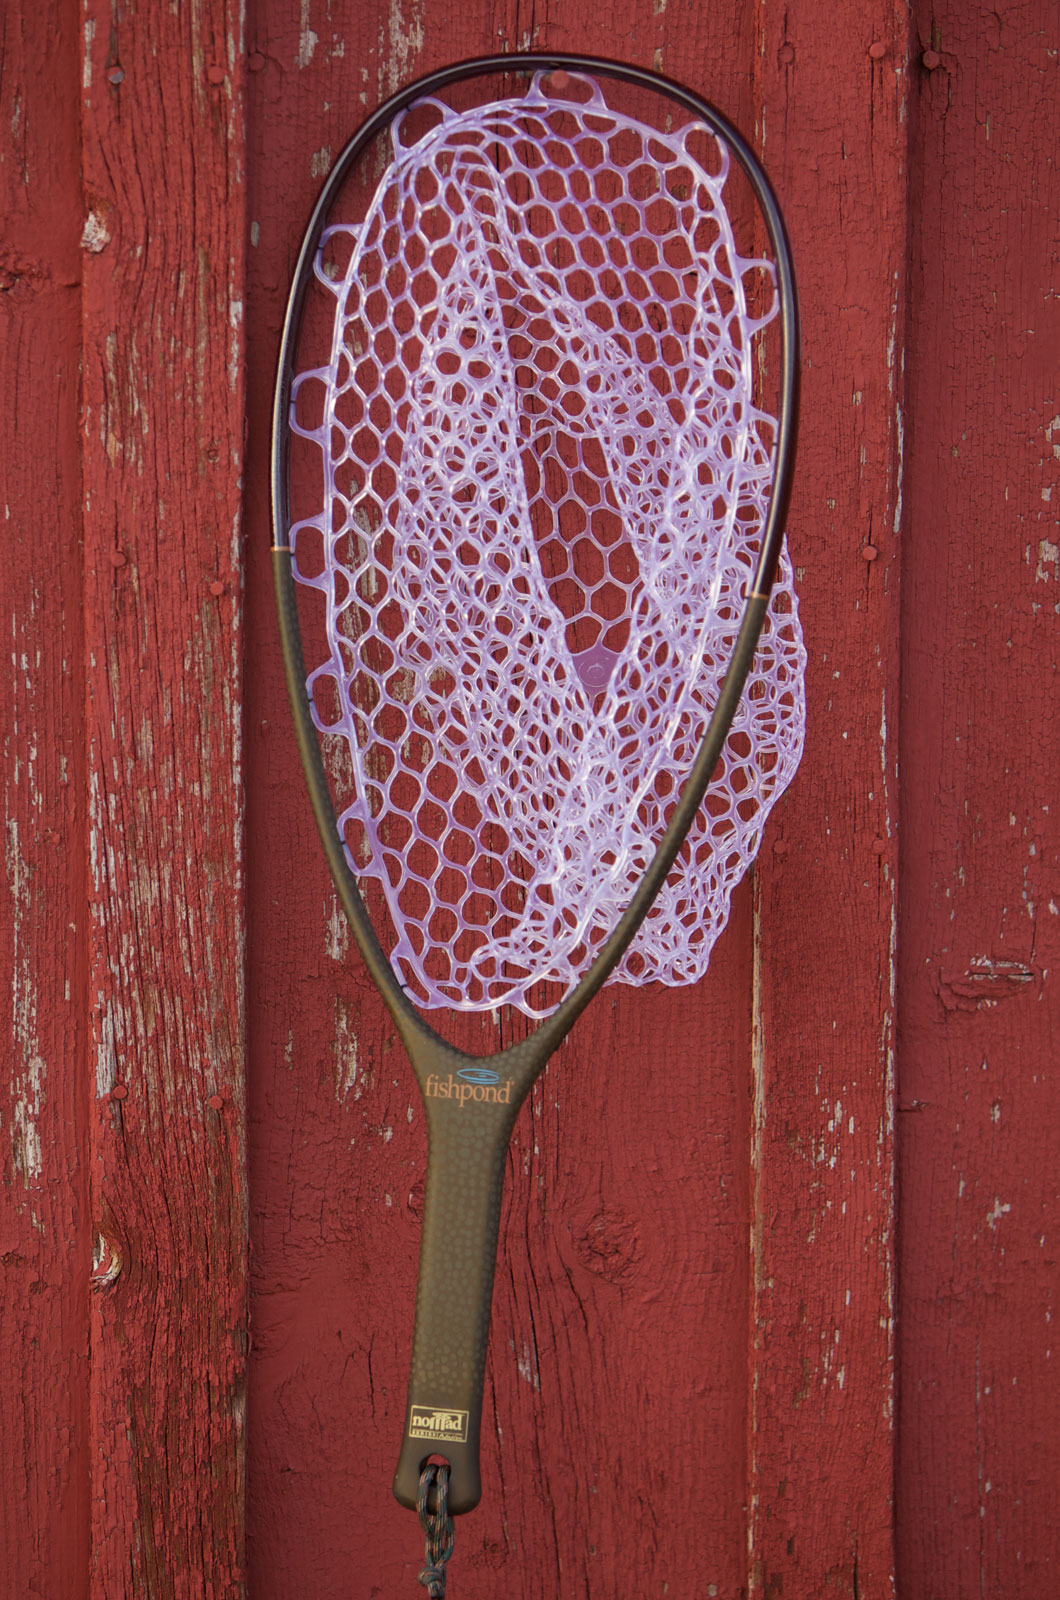 Fishpond nomad native fly fishing landing net carbon fiber for Best fly fishing nets